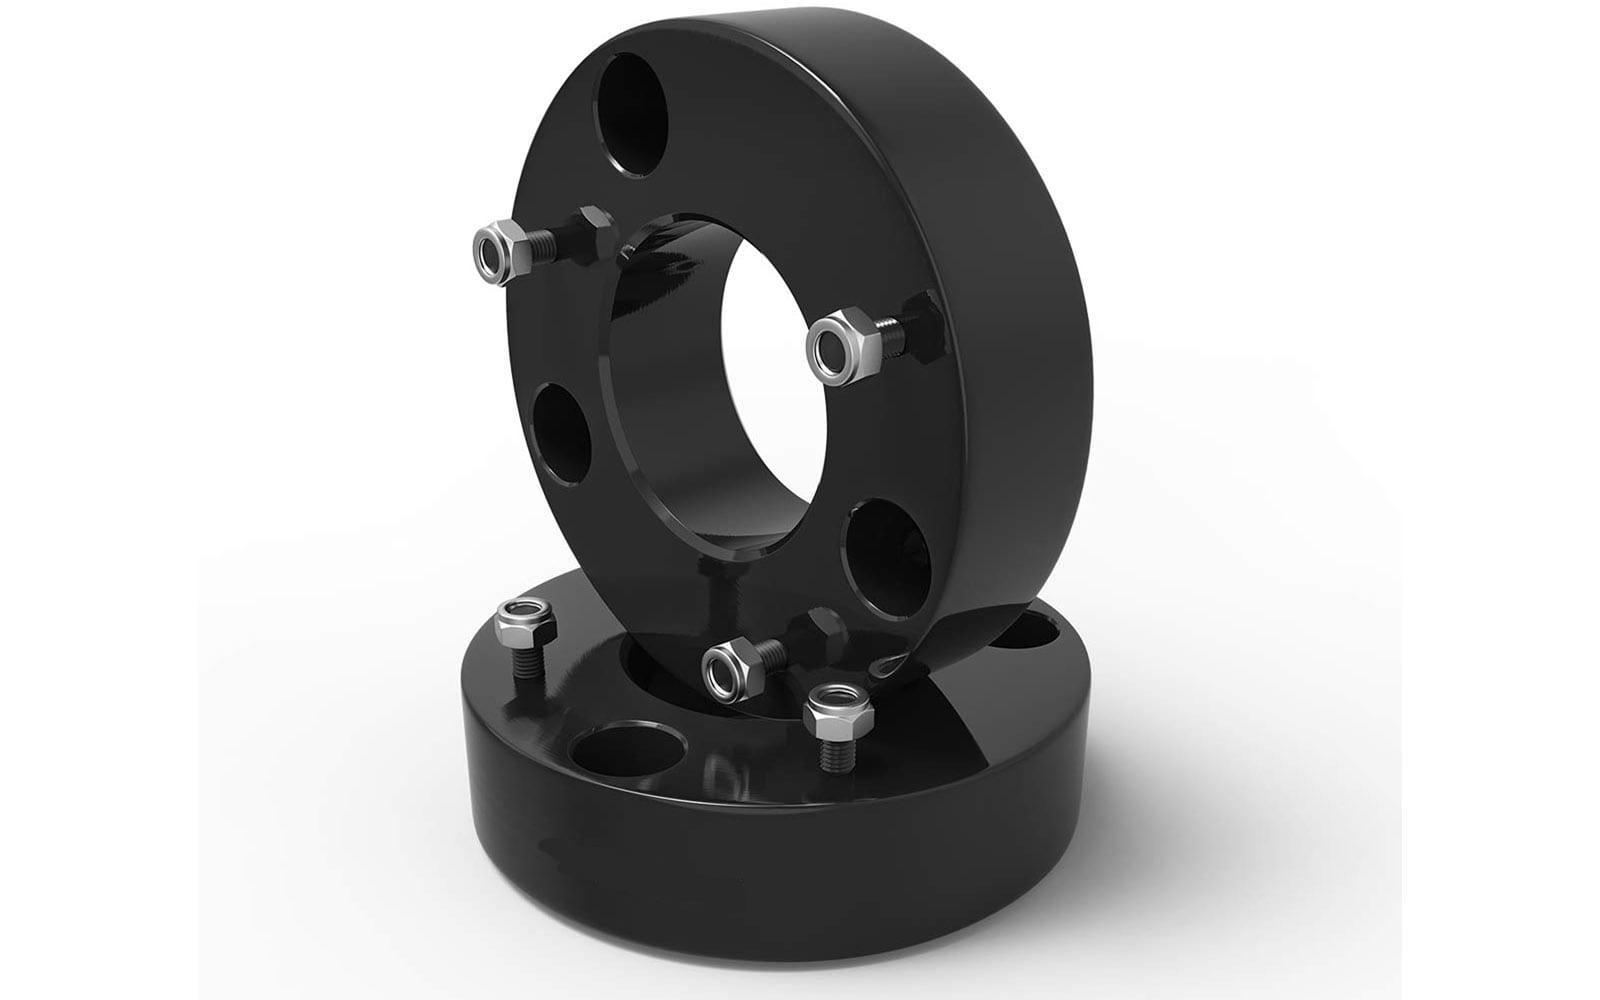 Best F150 Leveling Kit - July 2020 I mechanicguides.com